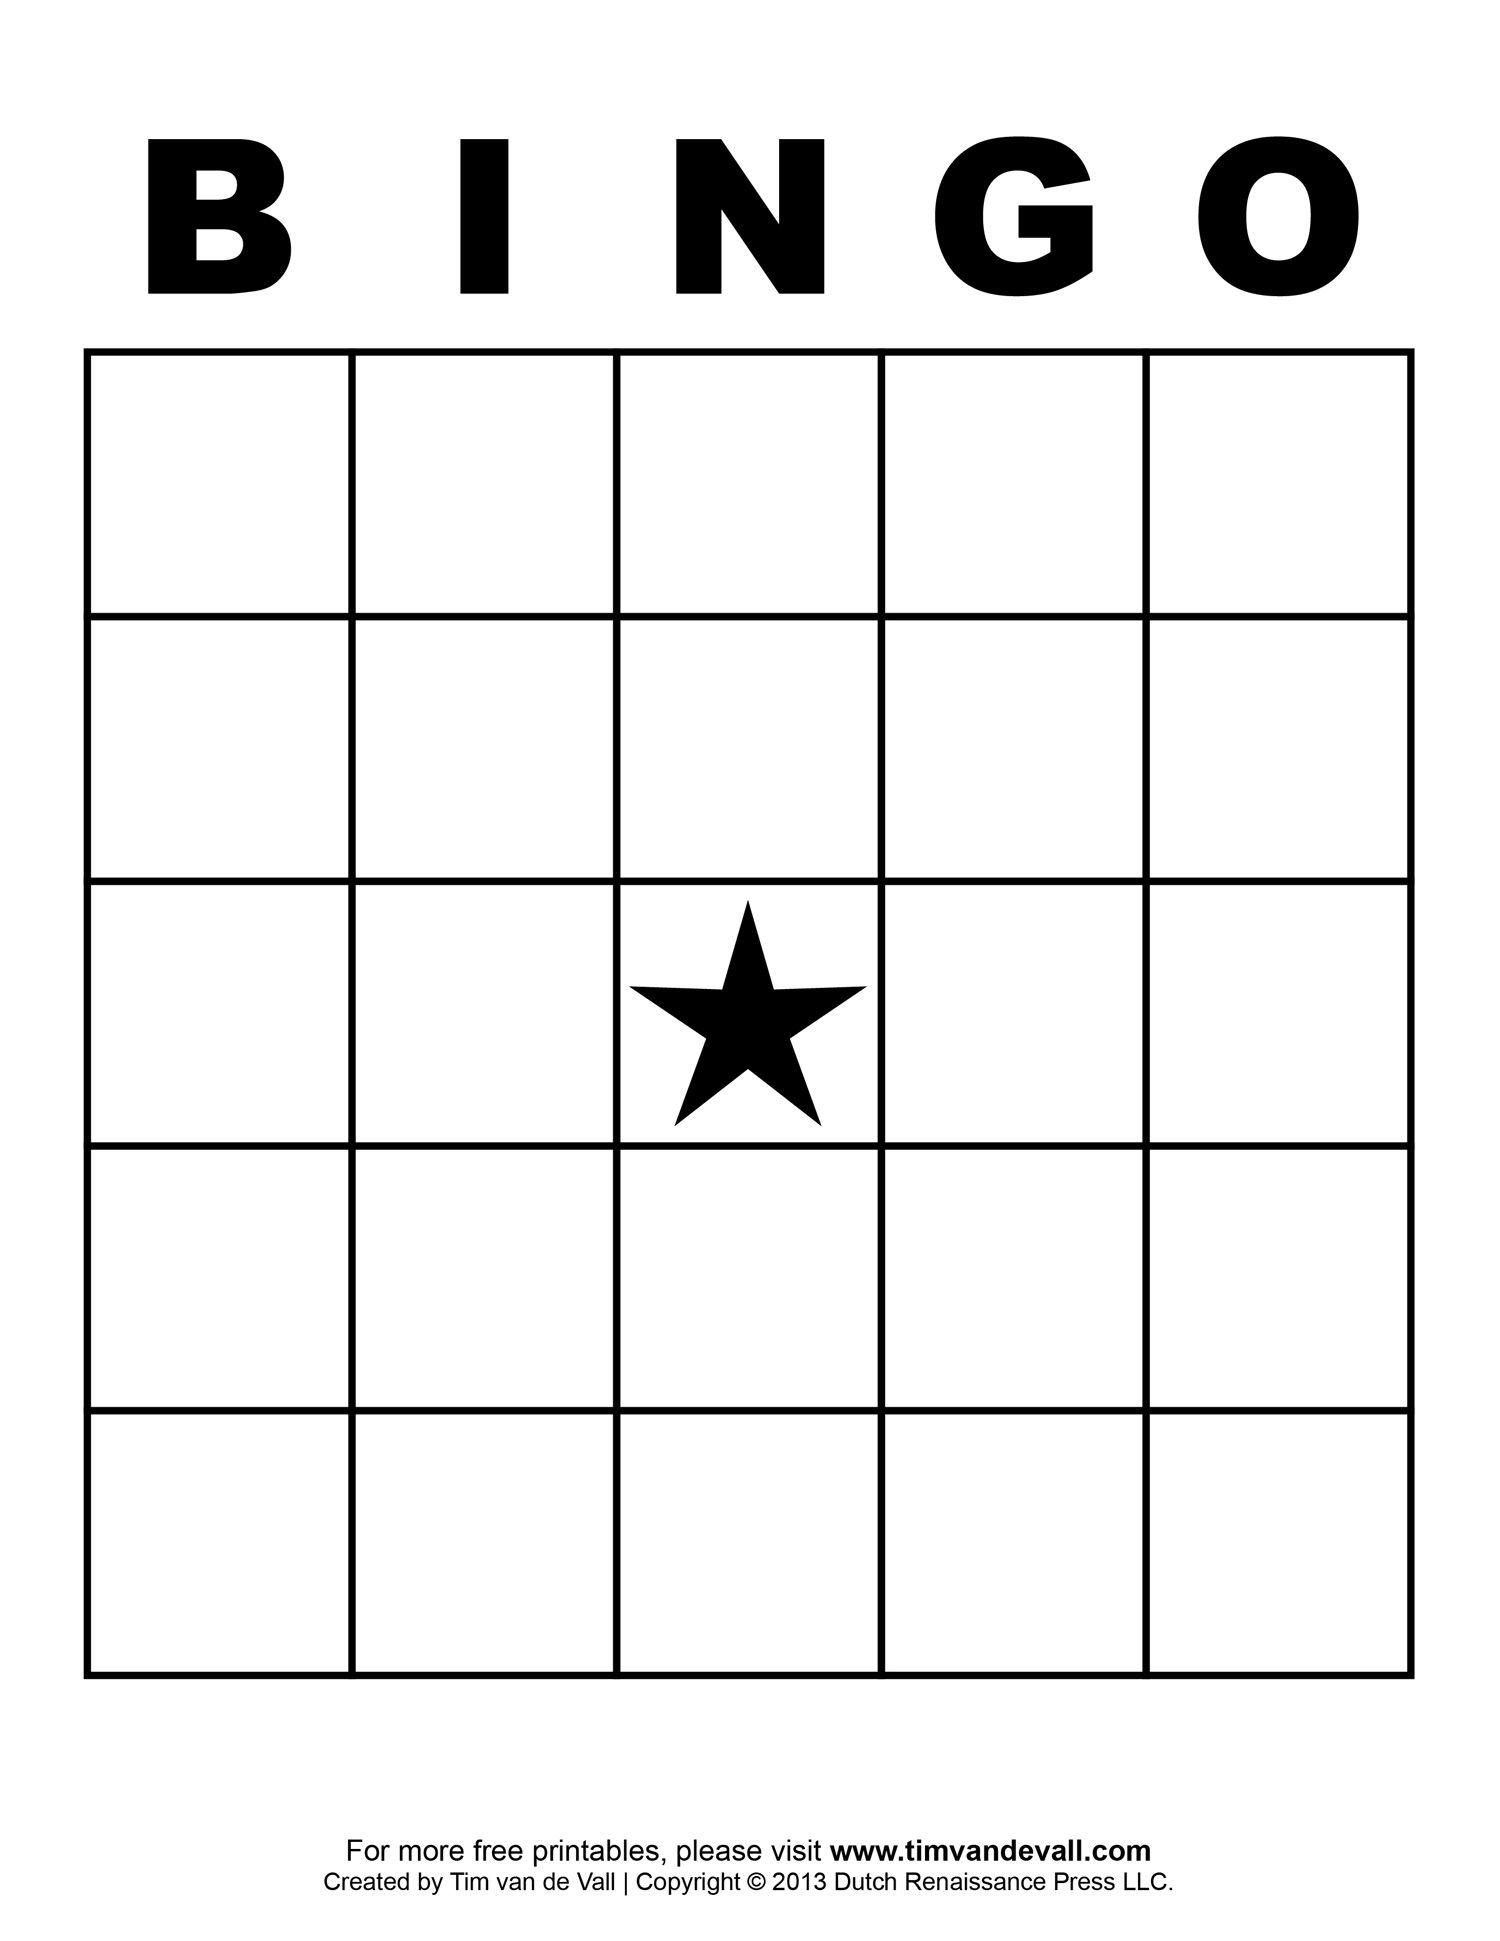 Free Printable Blank Bingo Cards Template 4 X 4 | Classroom | Sight - Free Printable Bingo